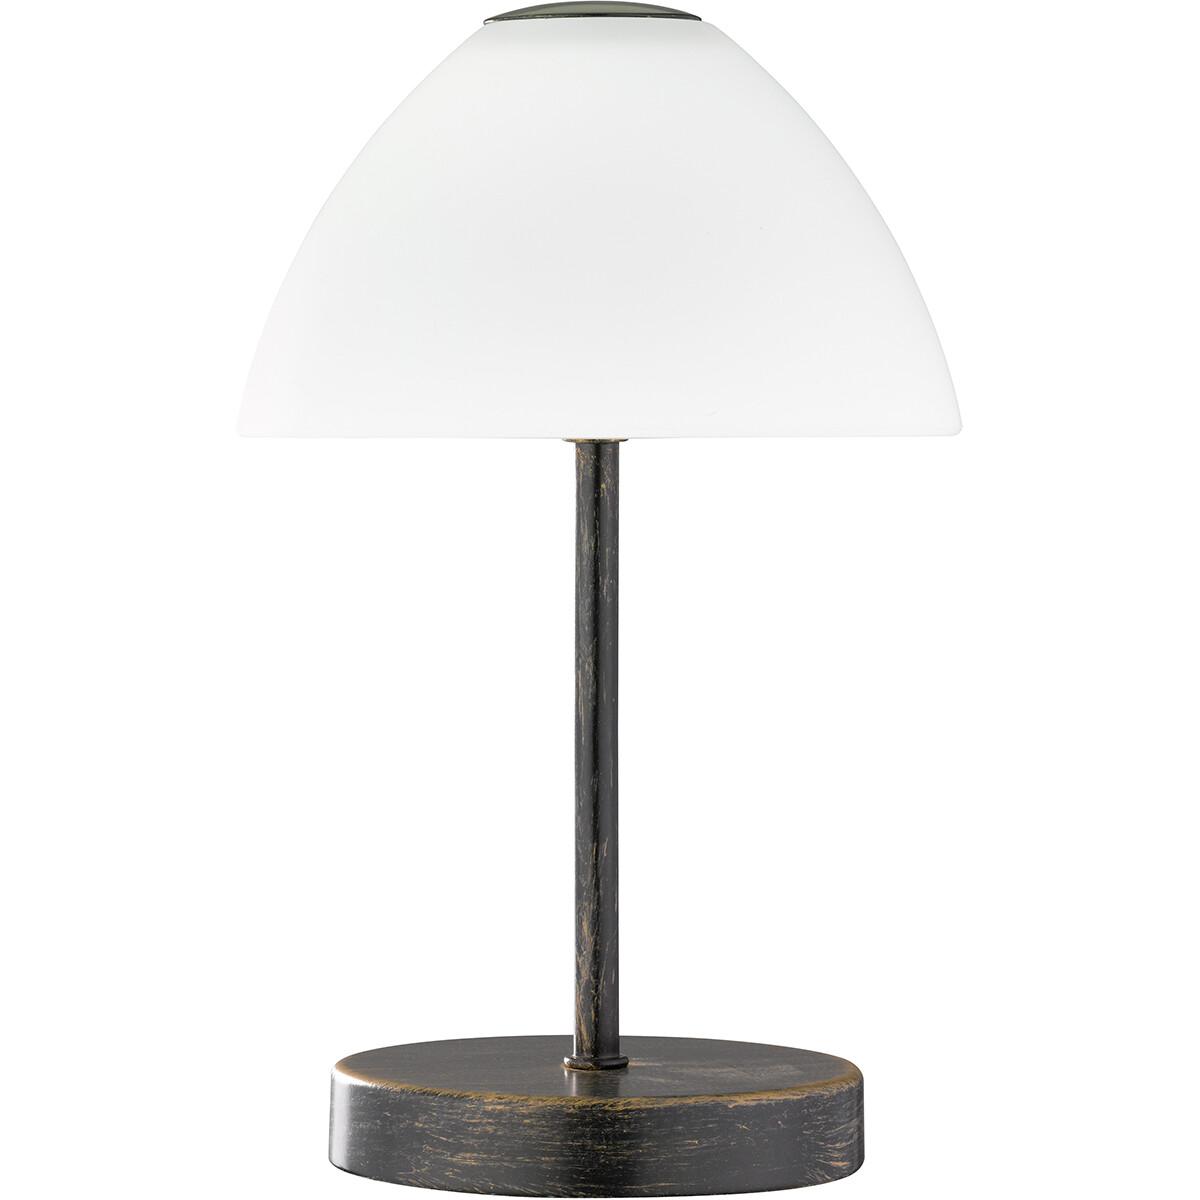 LED Tafellamp - Tafelverlichting - Trion Quno - 2W - Warm Wit 3000K - Rond - Antiek Roestkleur - Alu